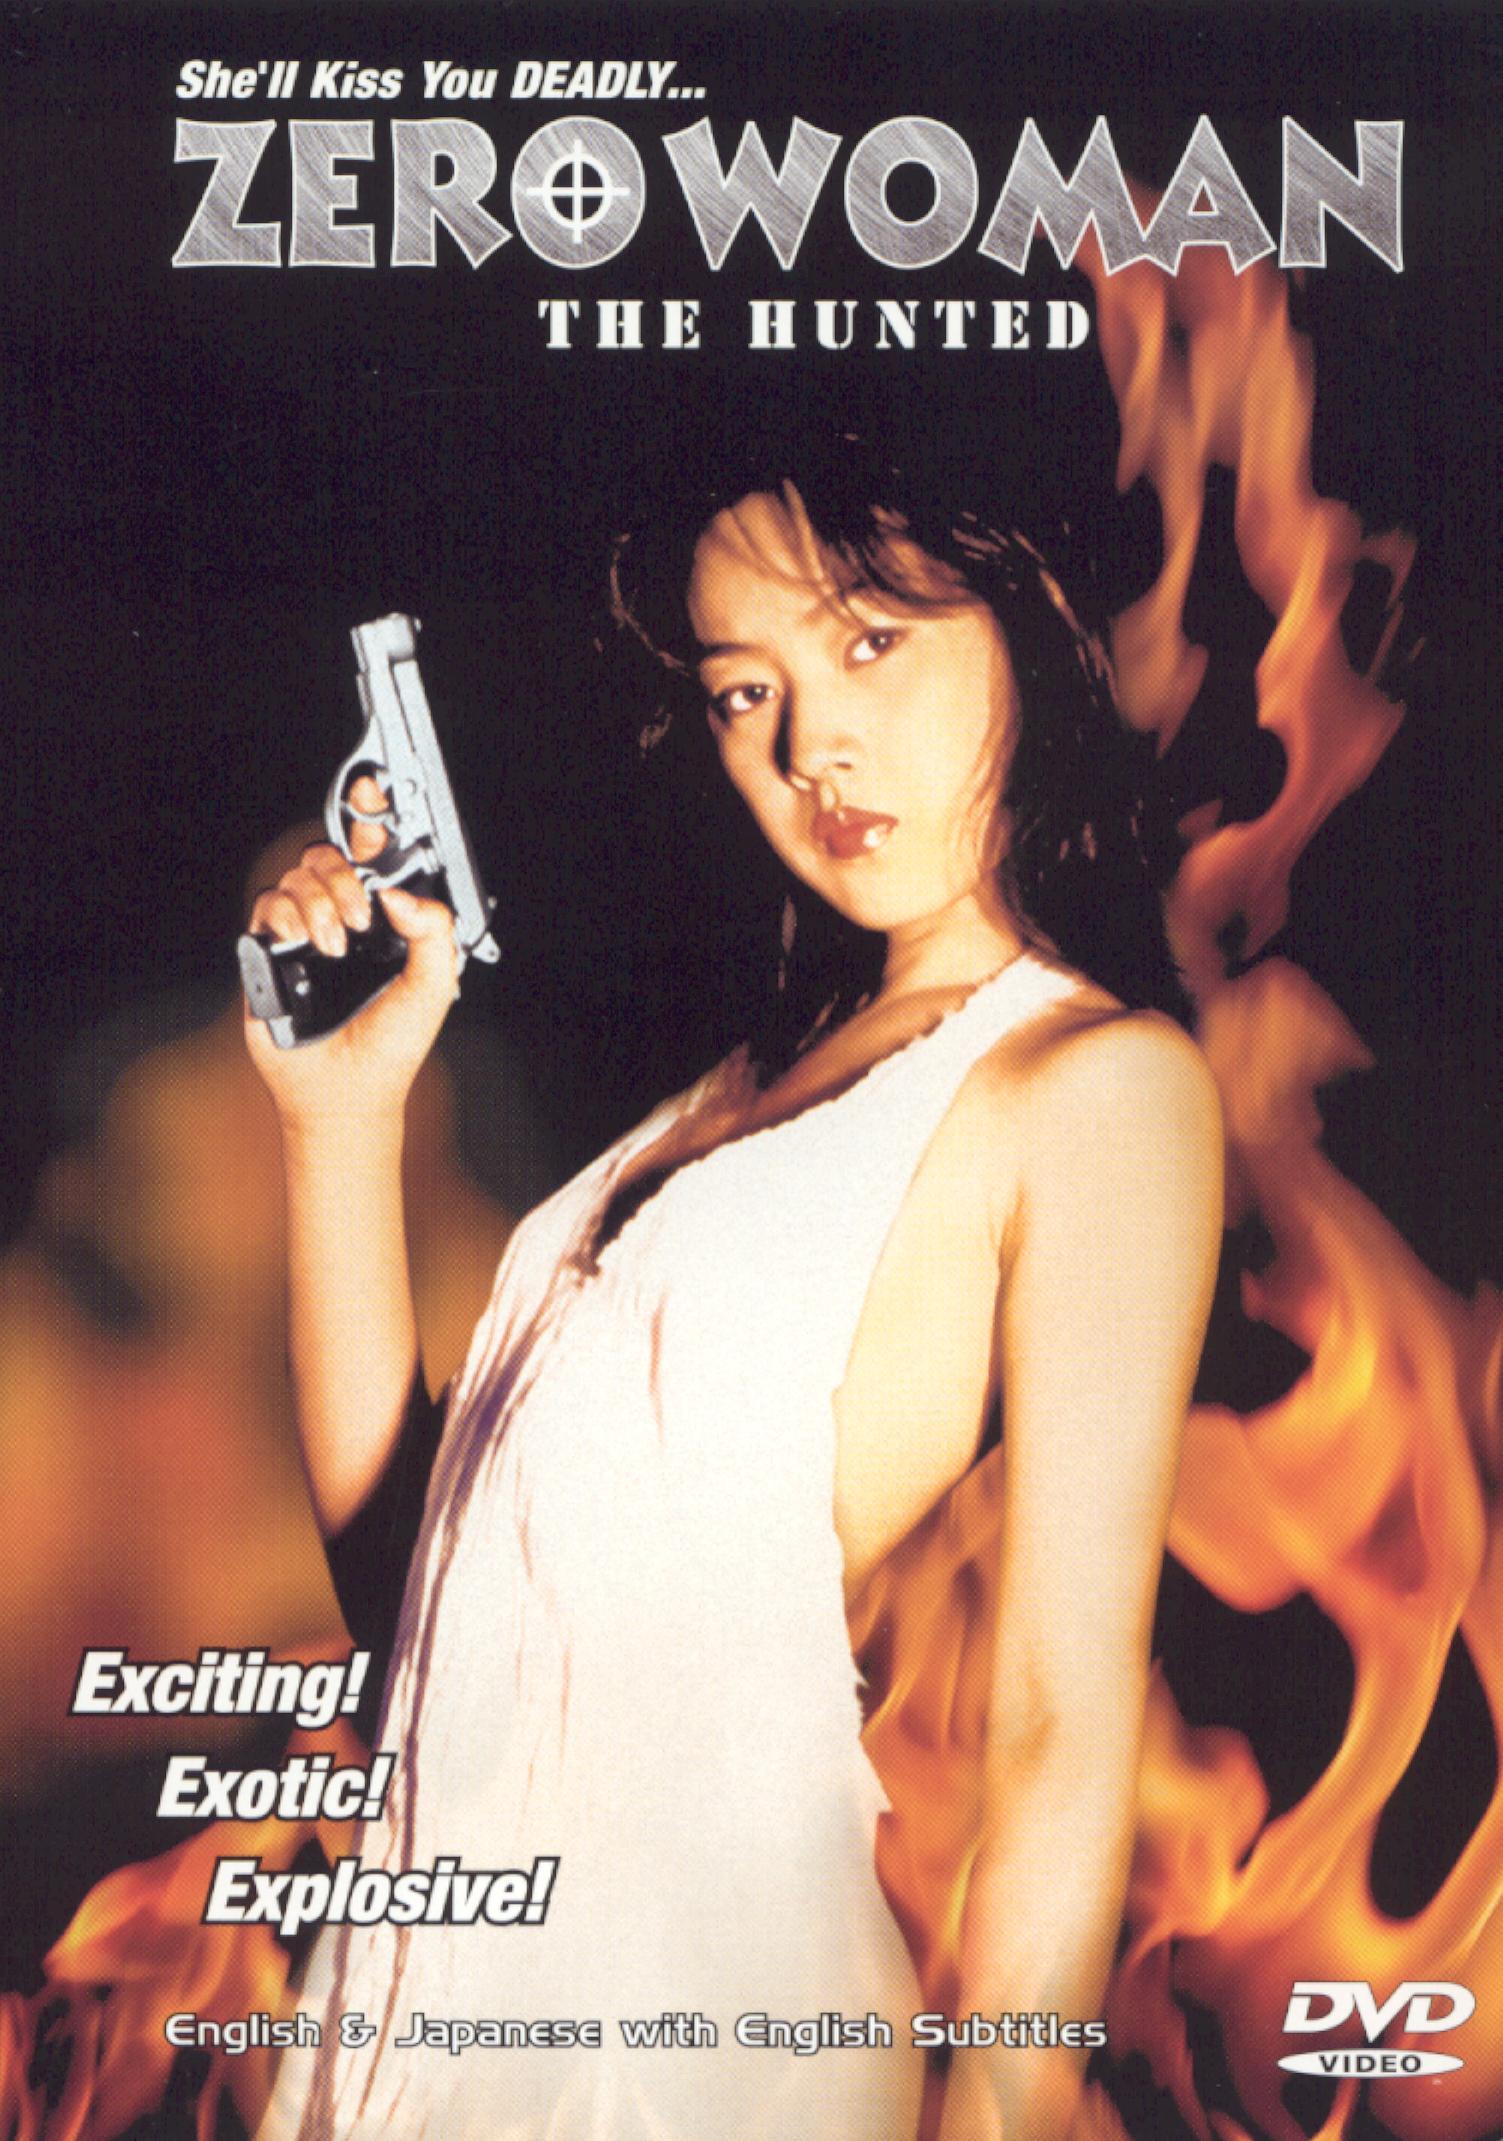 Zero Woman: The Hunted